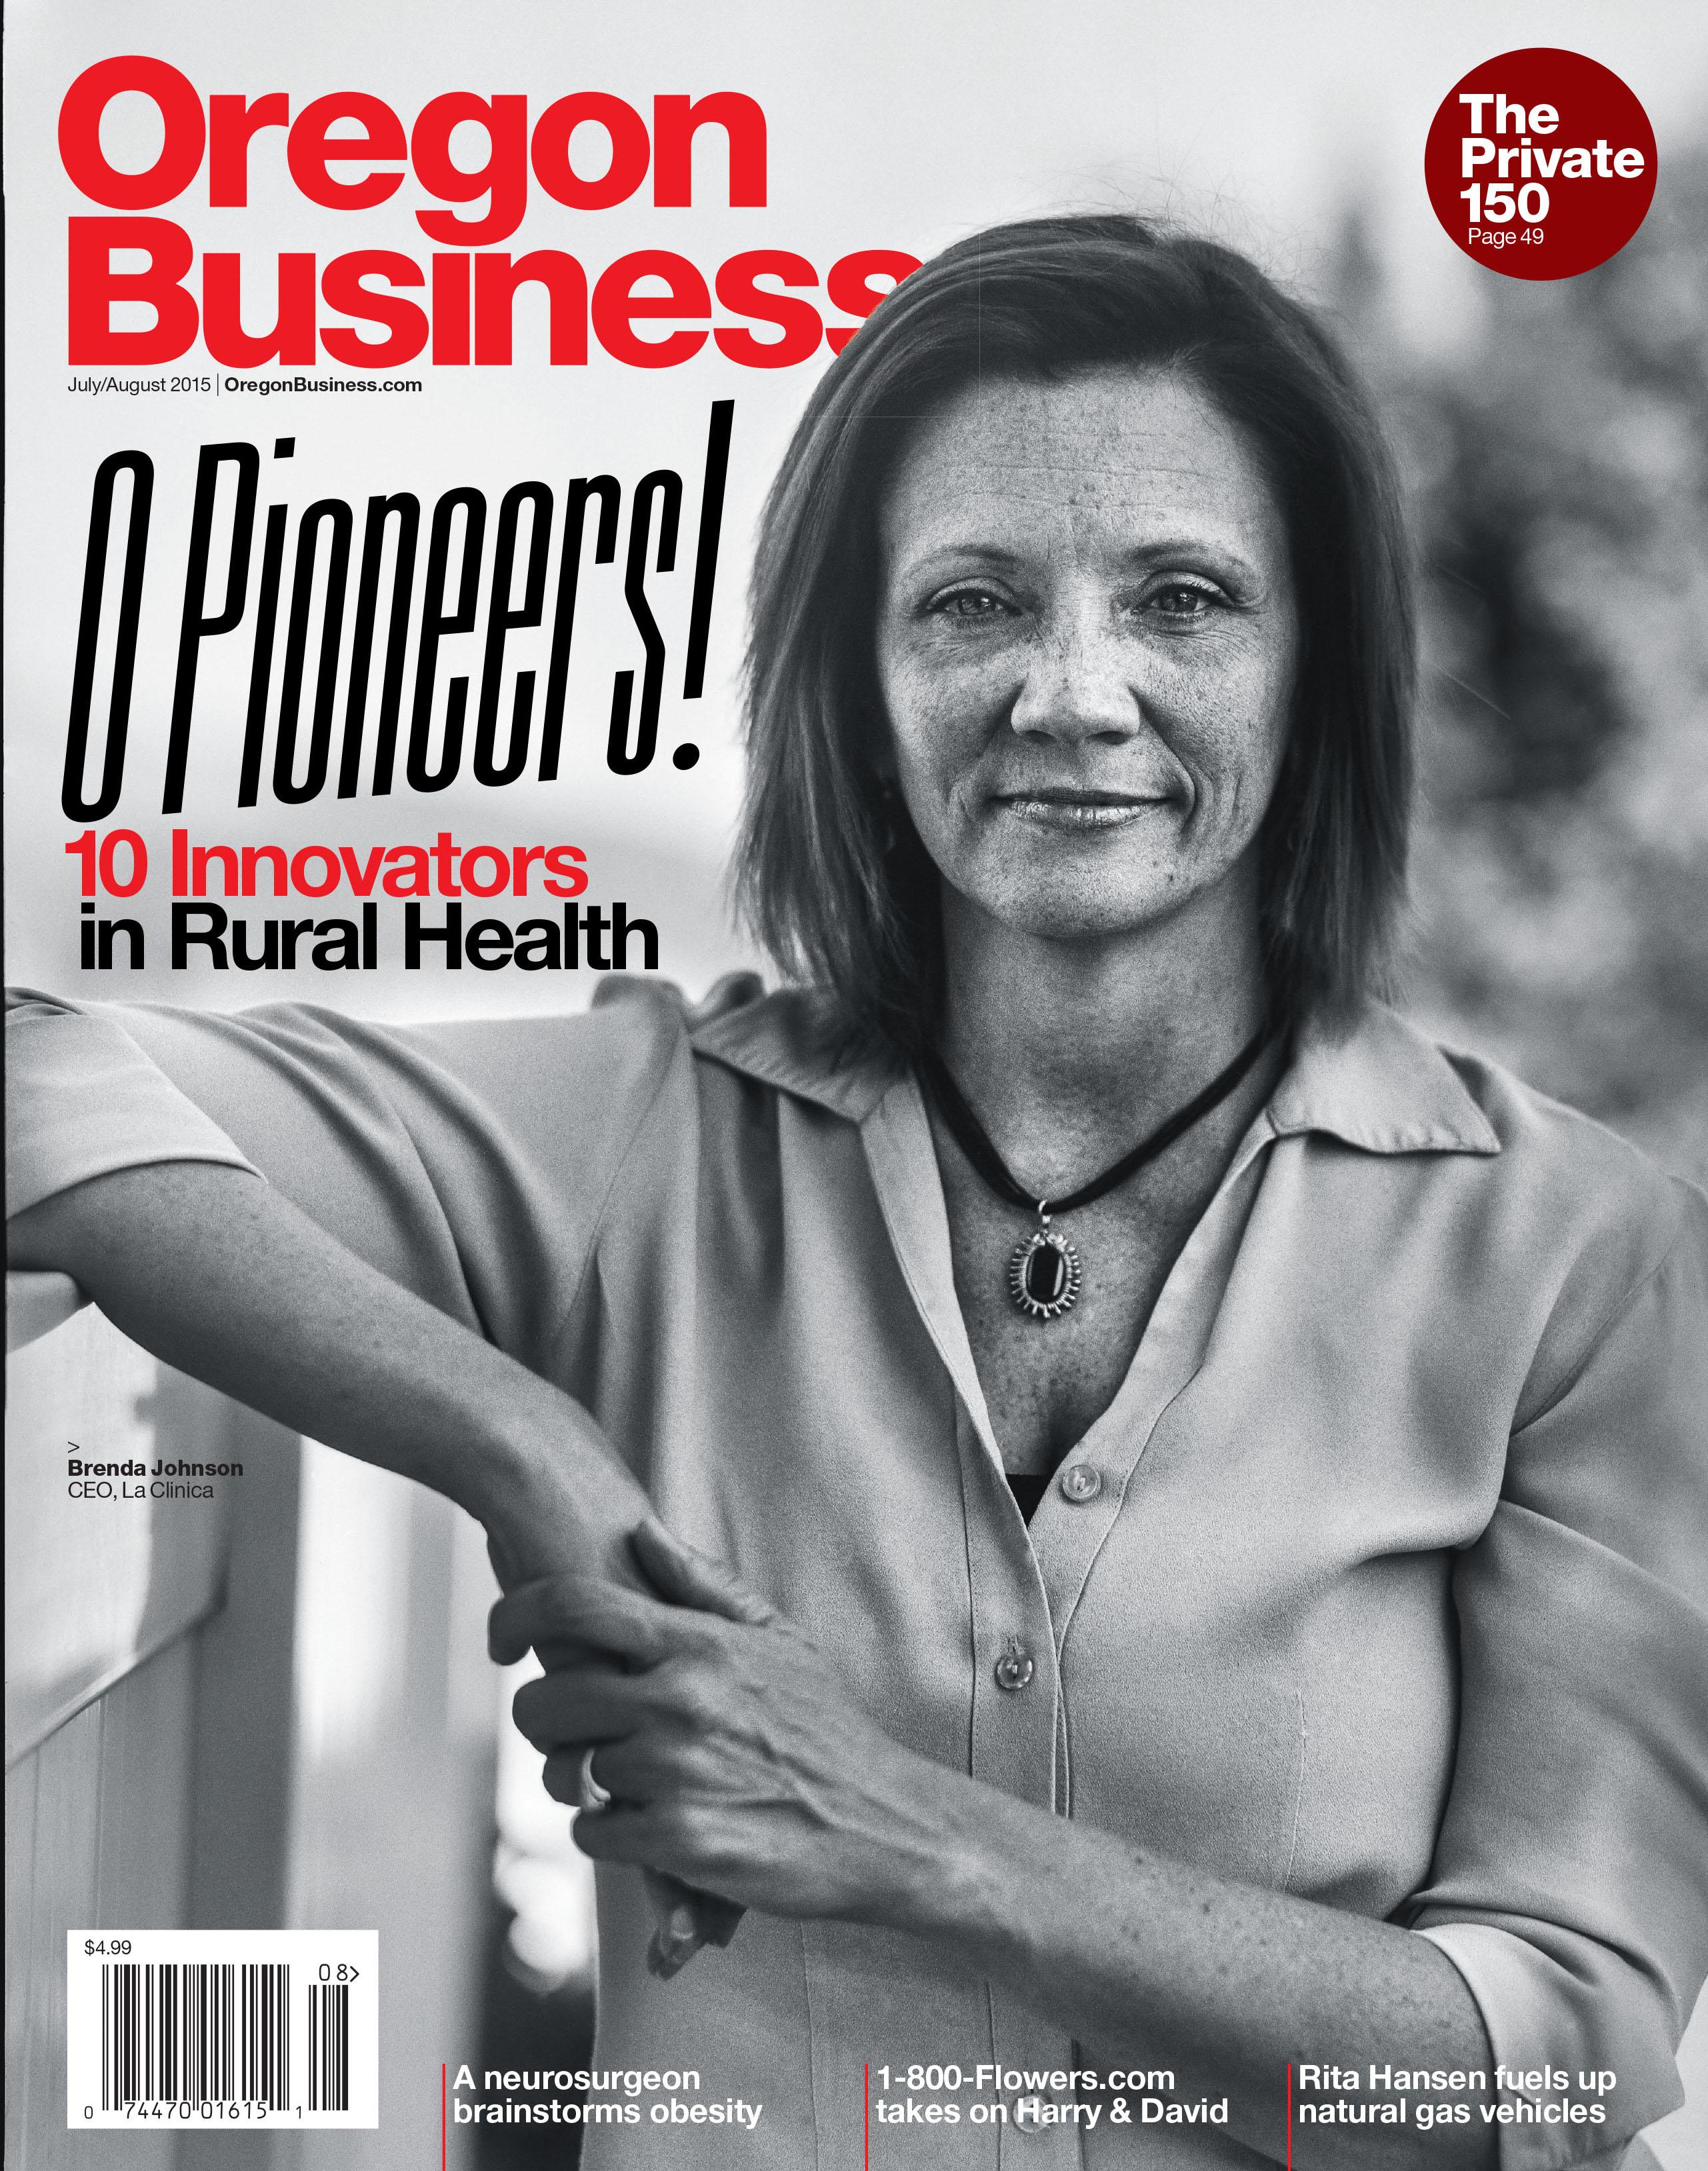 Oregon Business Magazine Cover July/Aug 2015